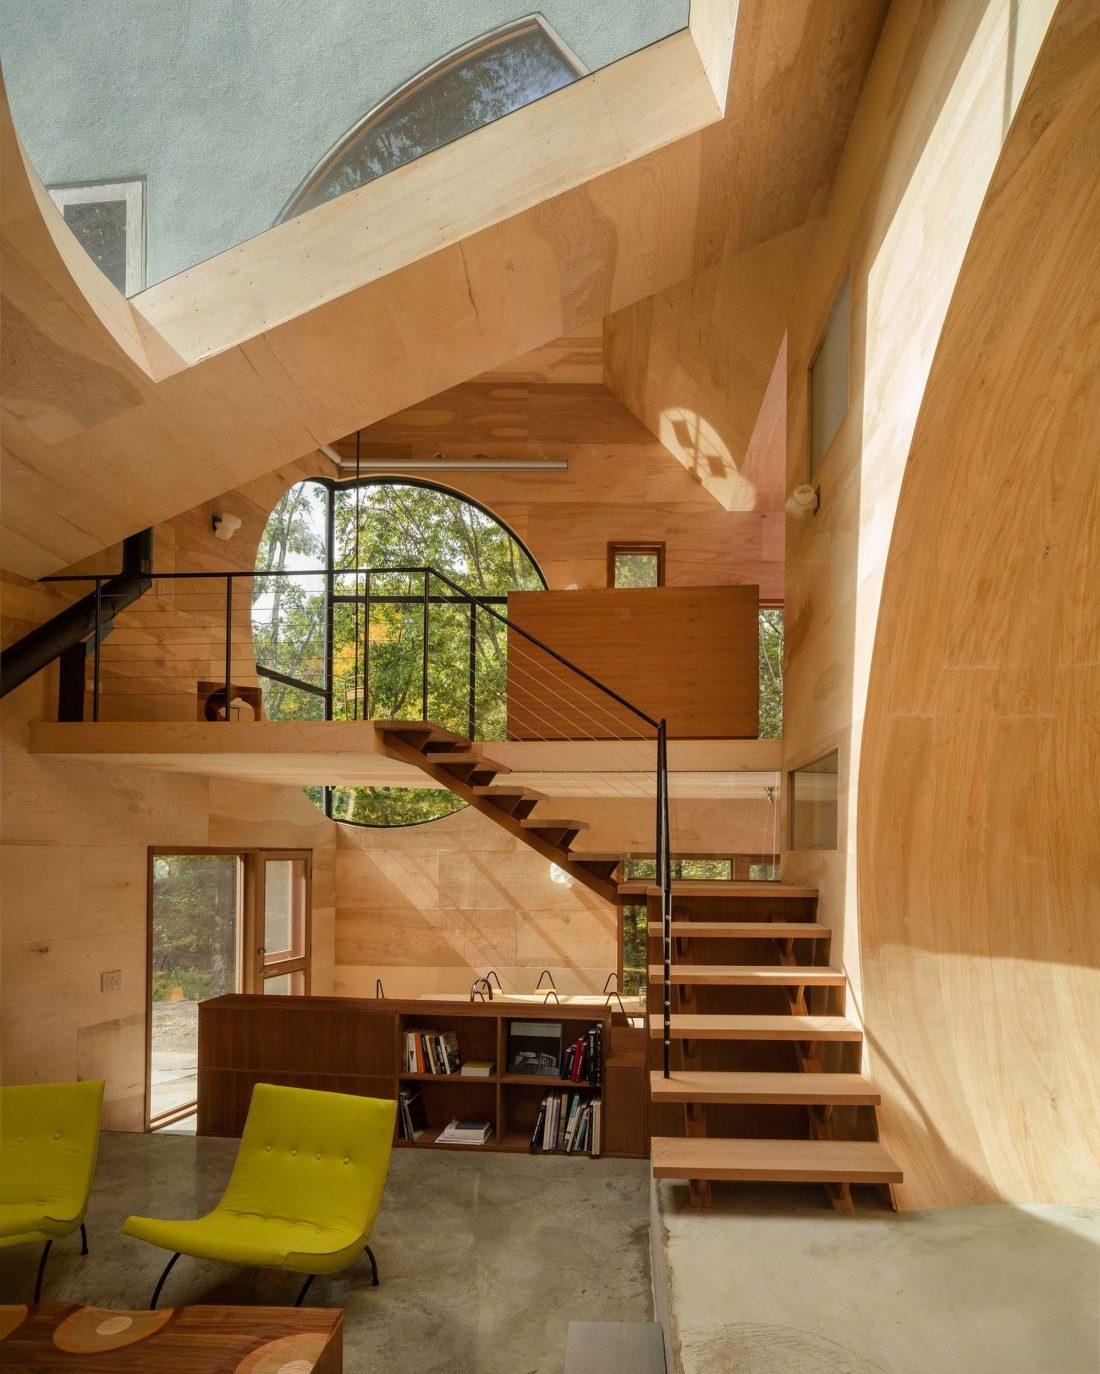 4d-gostevoj-dom-v-lesu-po-proektu-steven-holl-architects-25